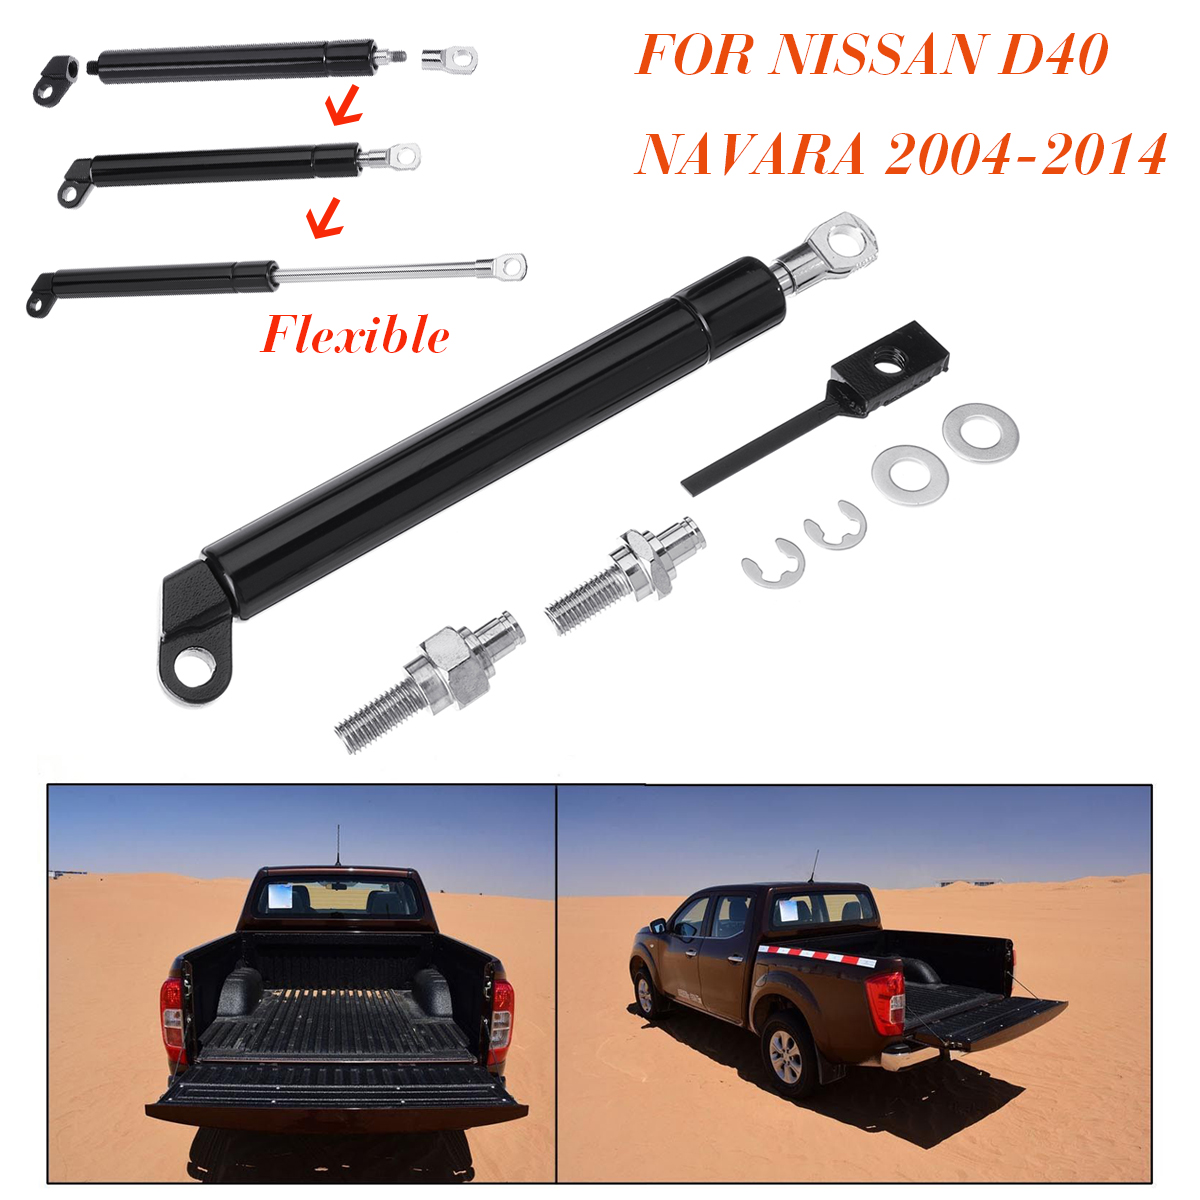 Para Nissan D40 Navara 2004-2014 portón trasero puerta trasera amortiguador de gas apoyo para maletero